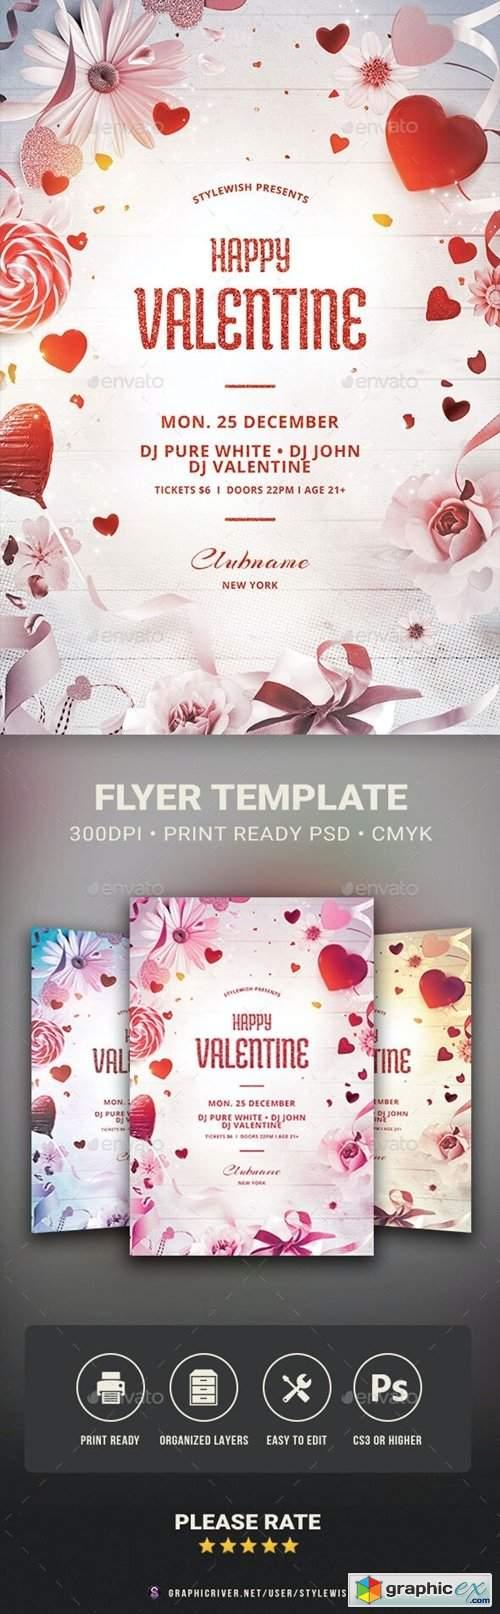 Happy Valentine Flyer 29779574